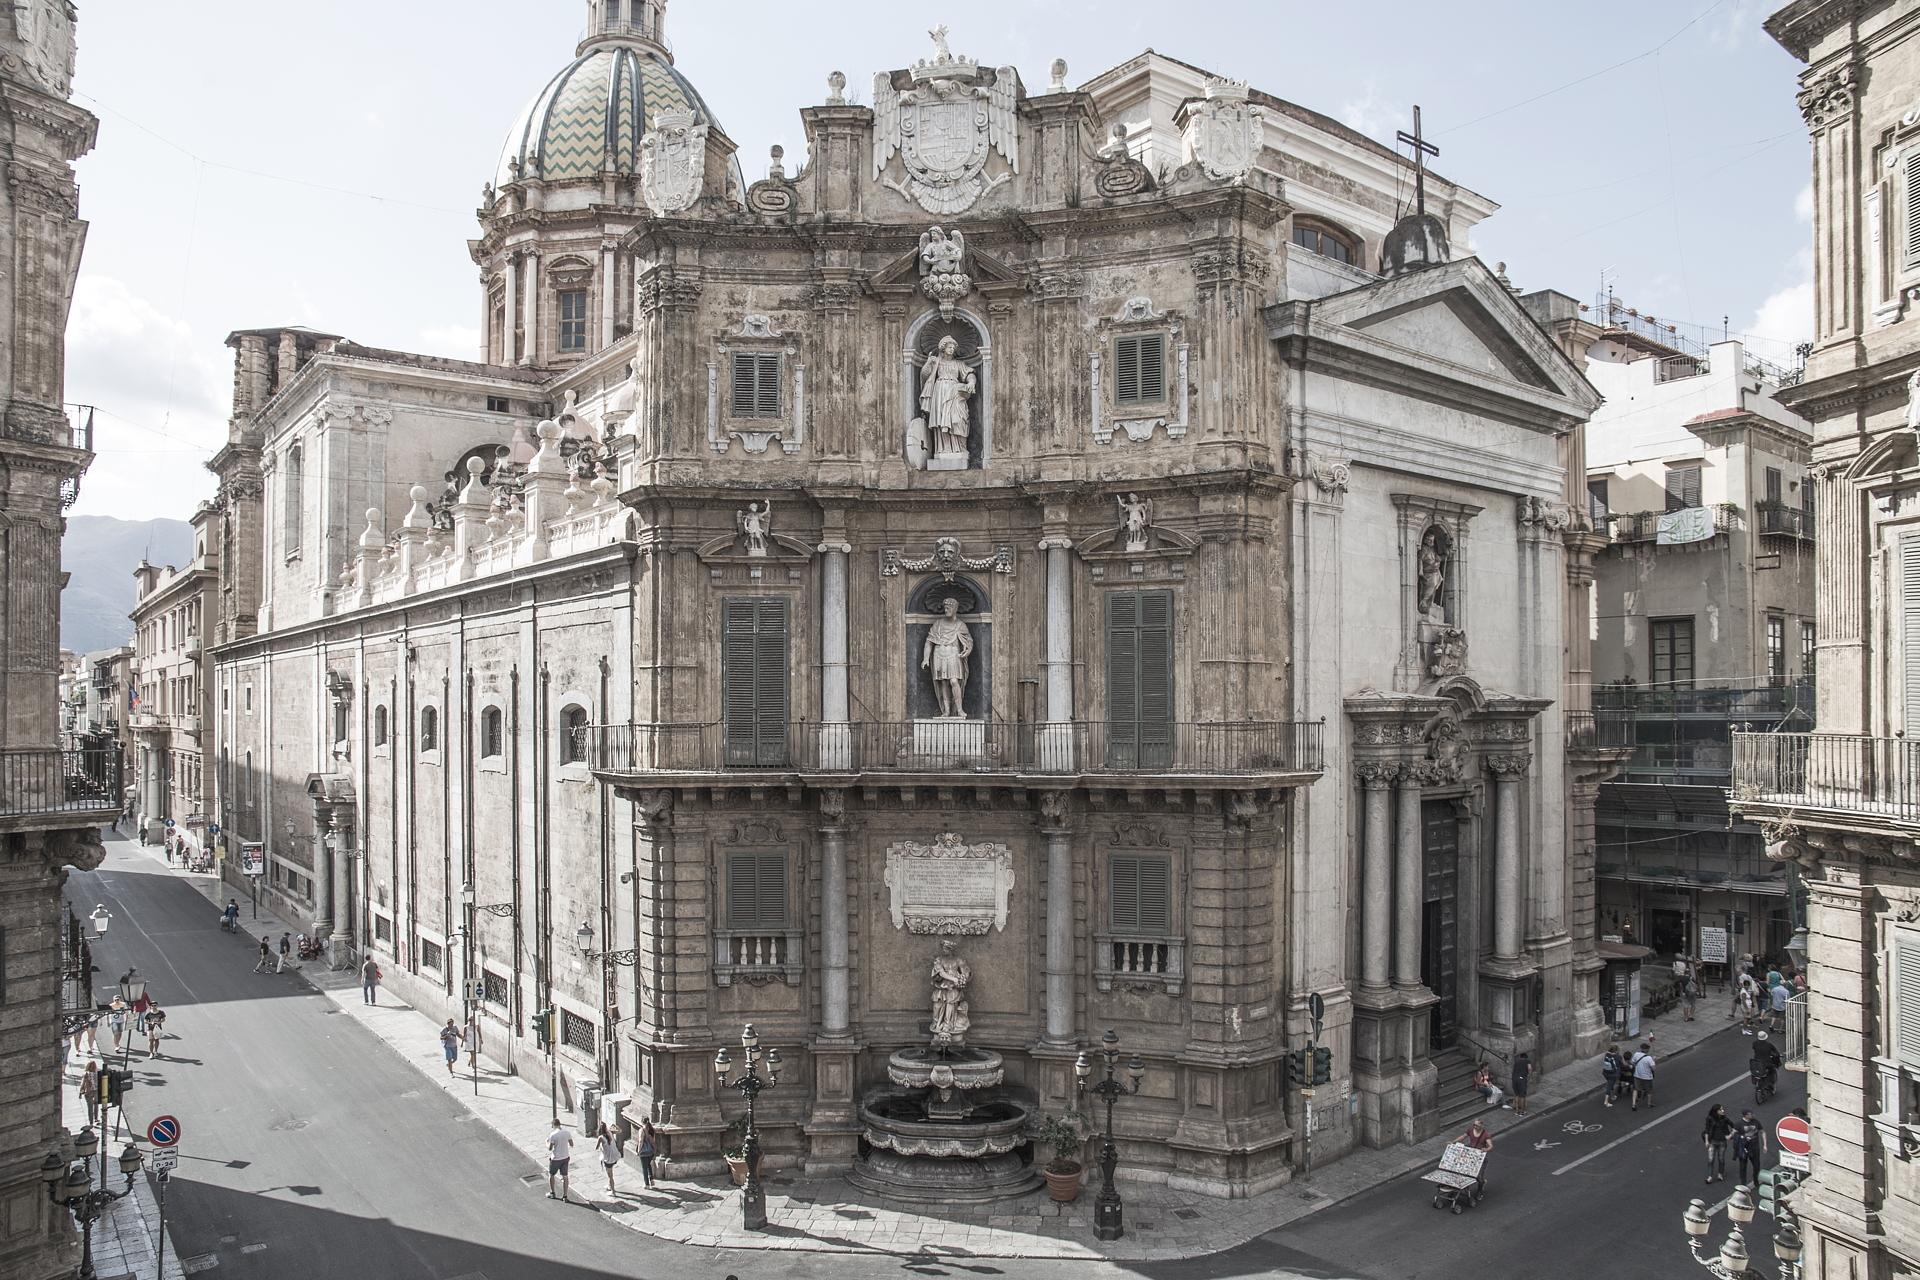 Niccolò Antonielli: Sicily